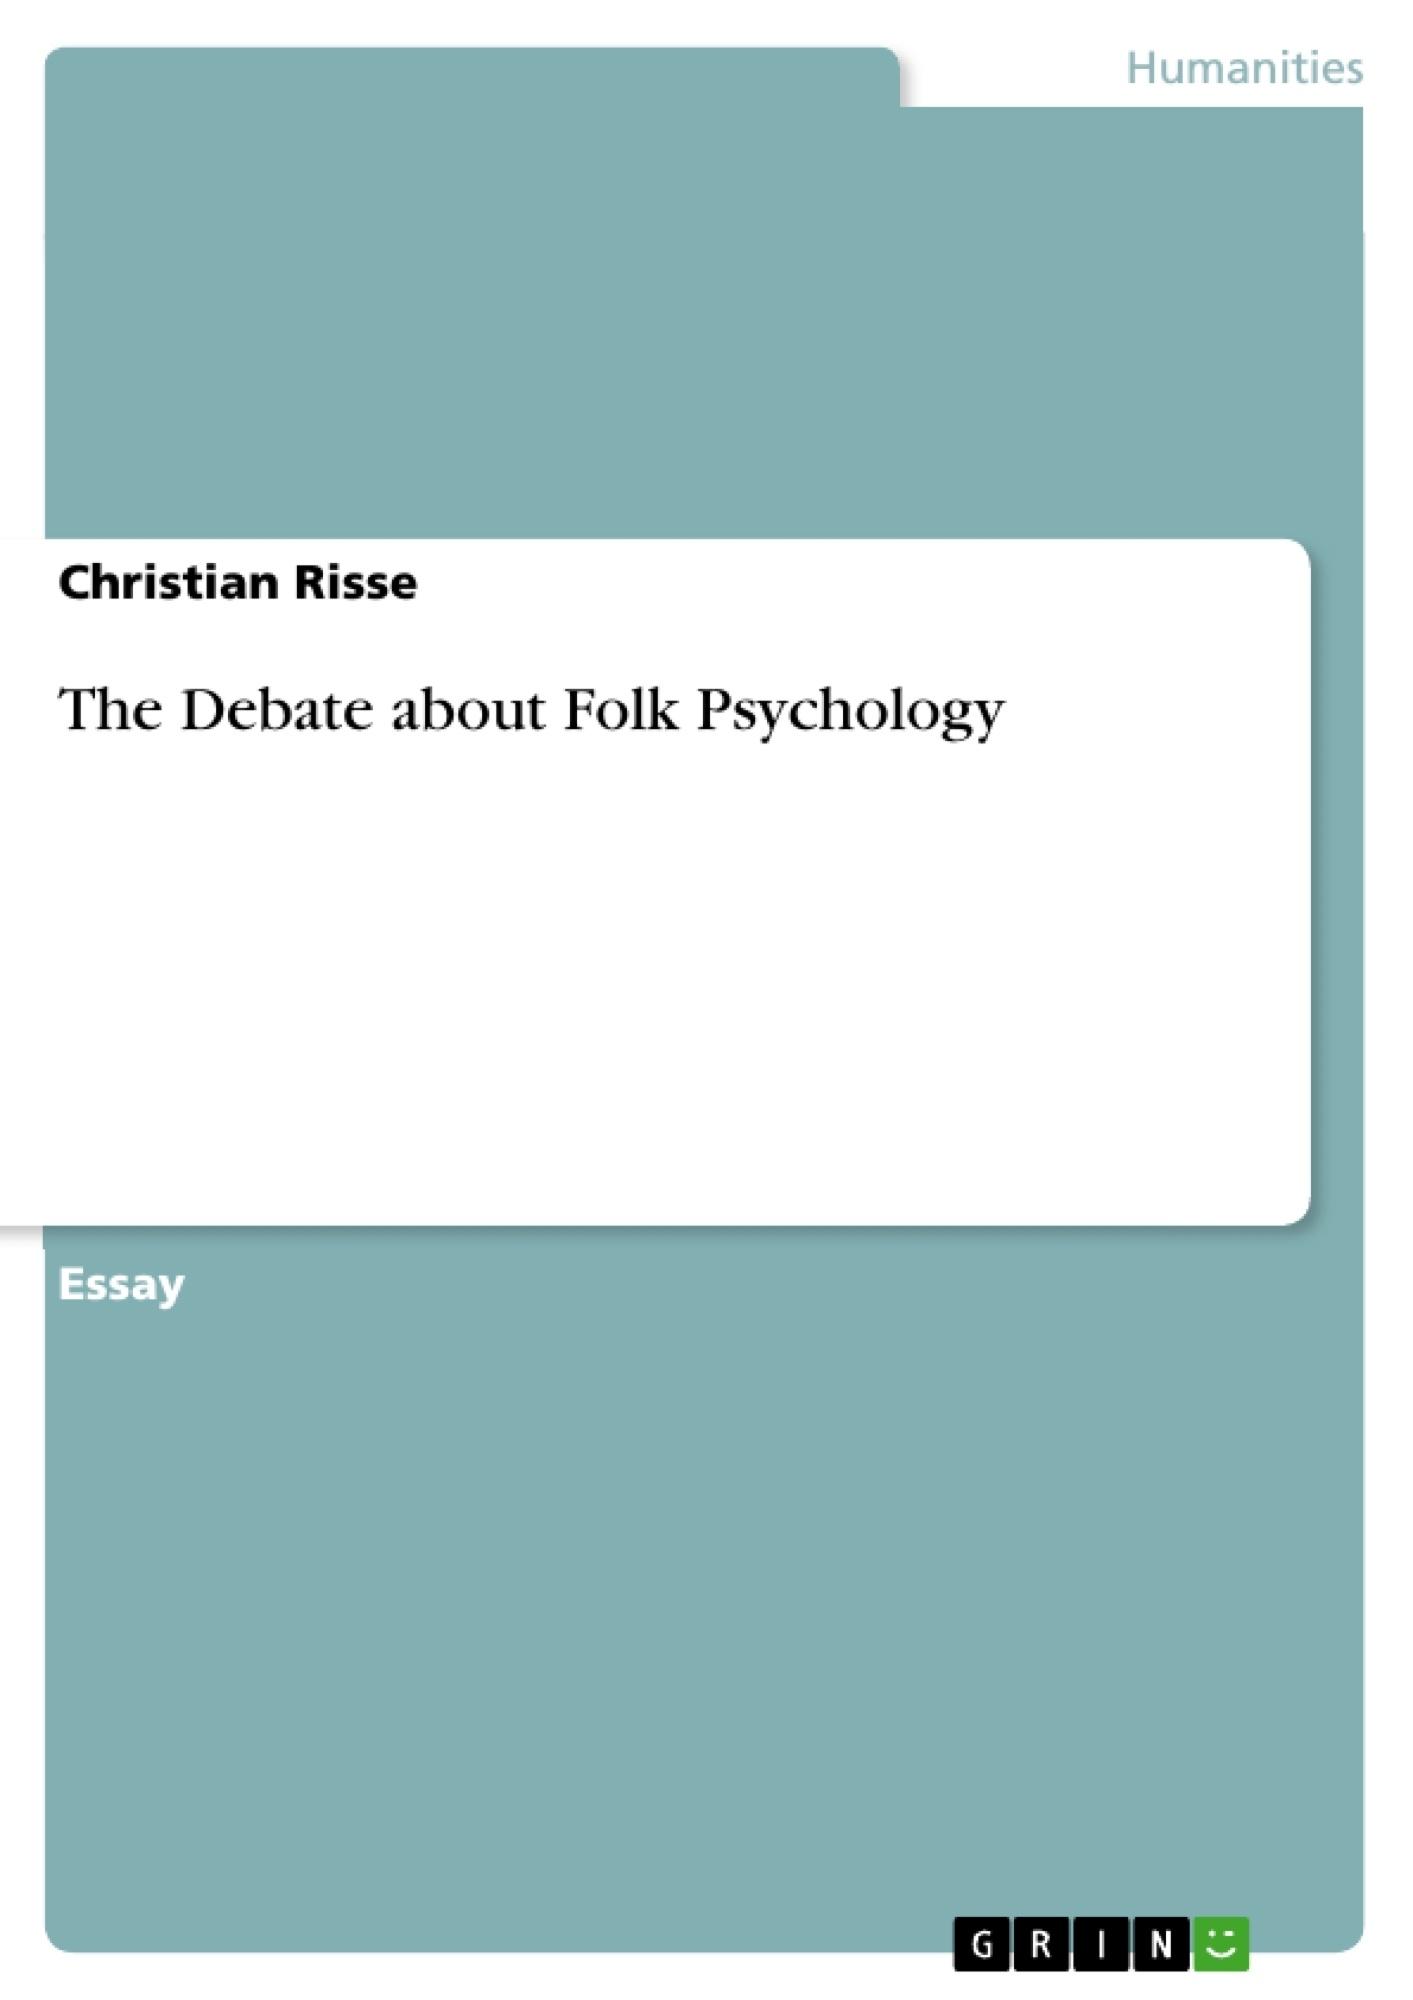 Title: The Debate about Folk Psychology